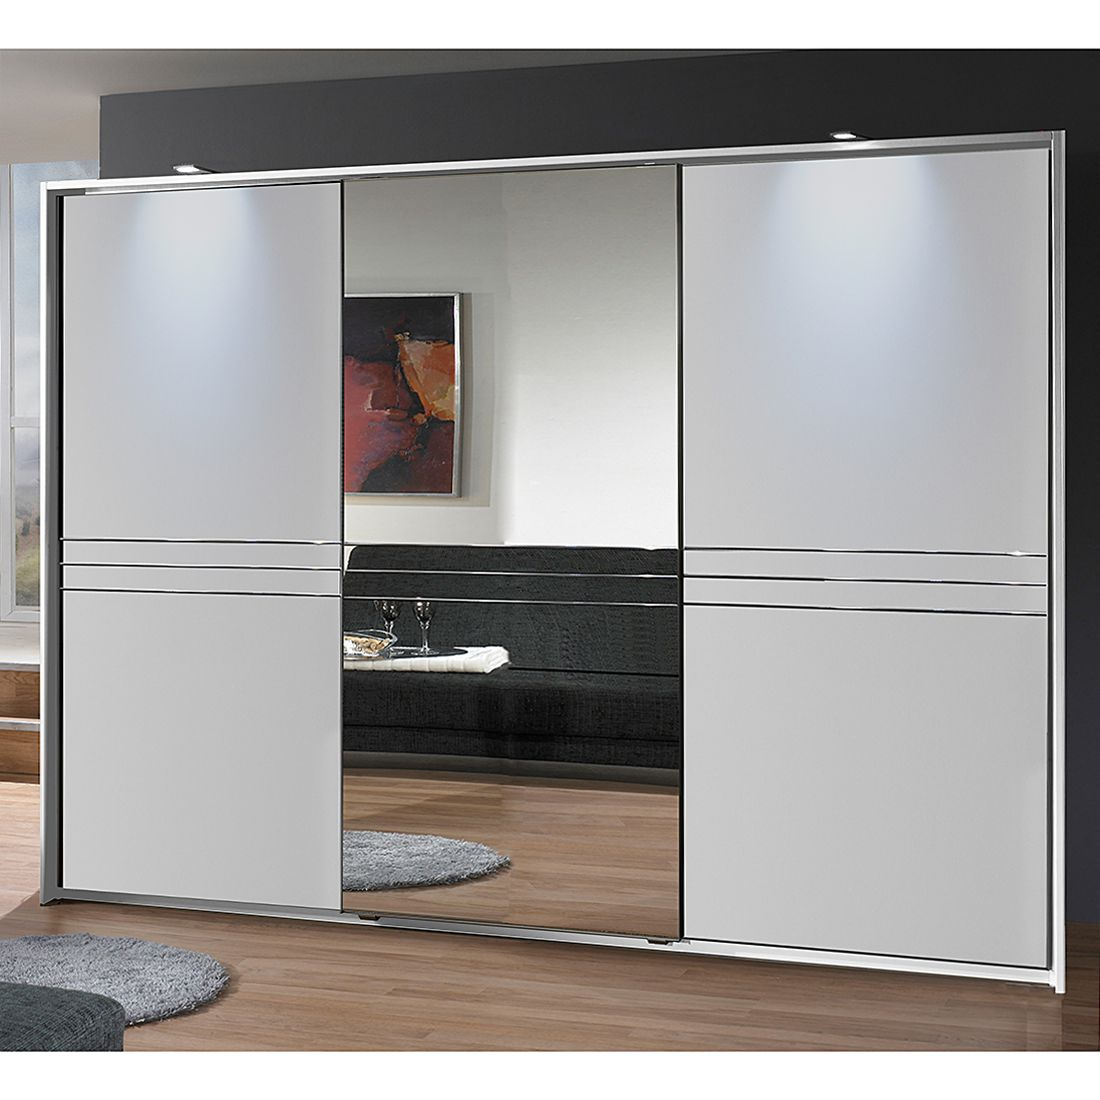 vente armoire tritoo maison et jardin. Black Bedroom Furniture Sets. Home Design Ideas